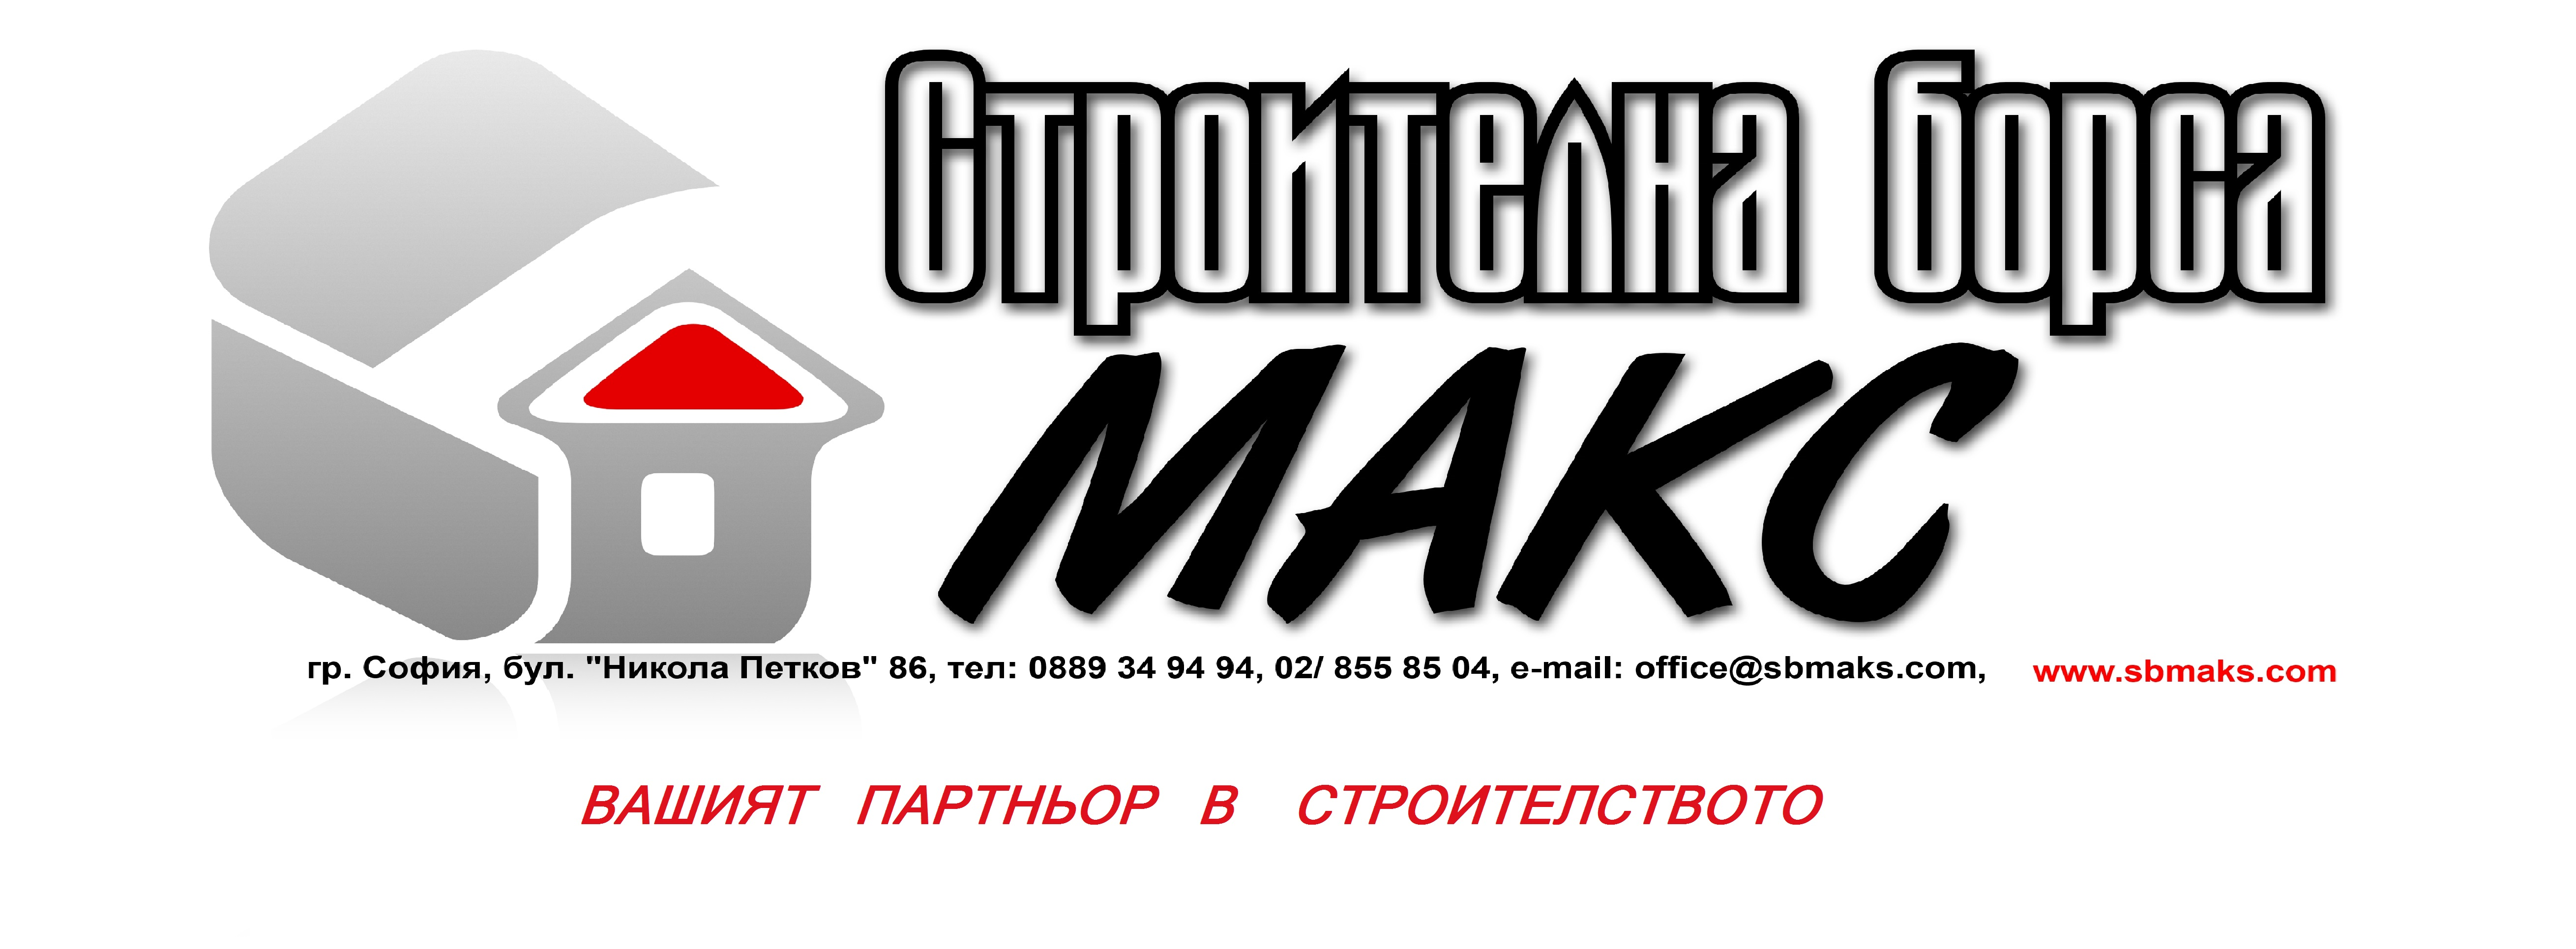 С. Б. Макс ООД